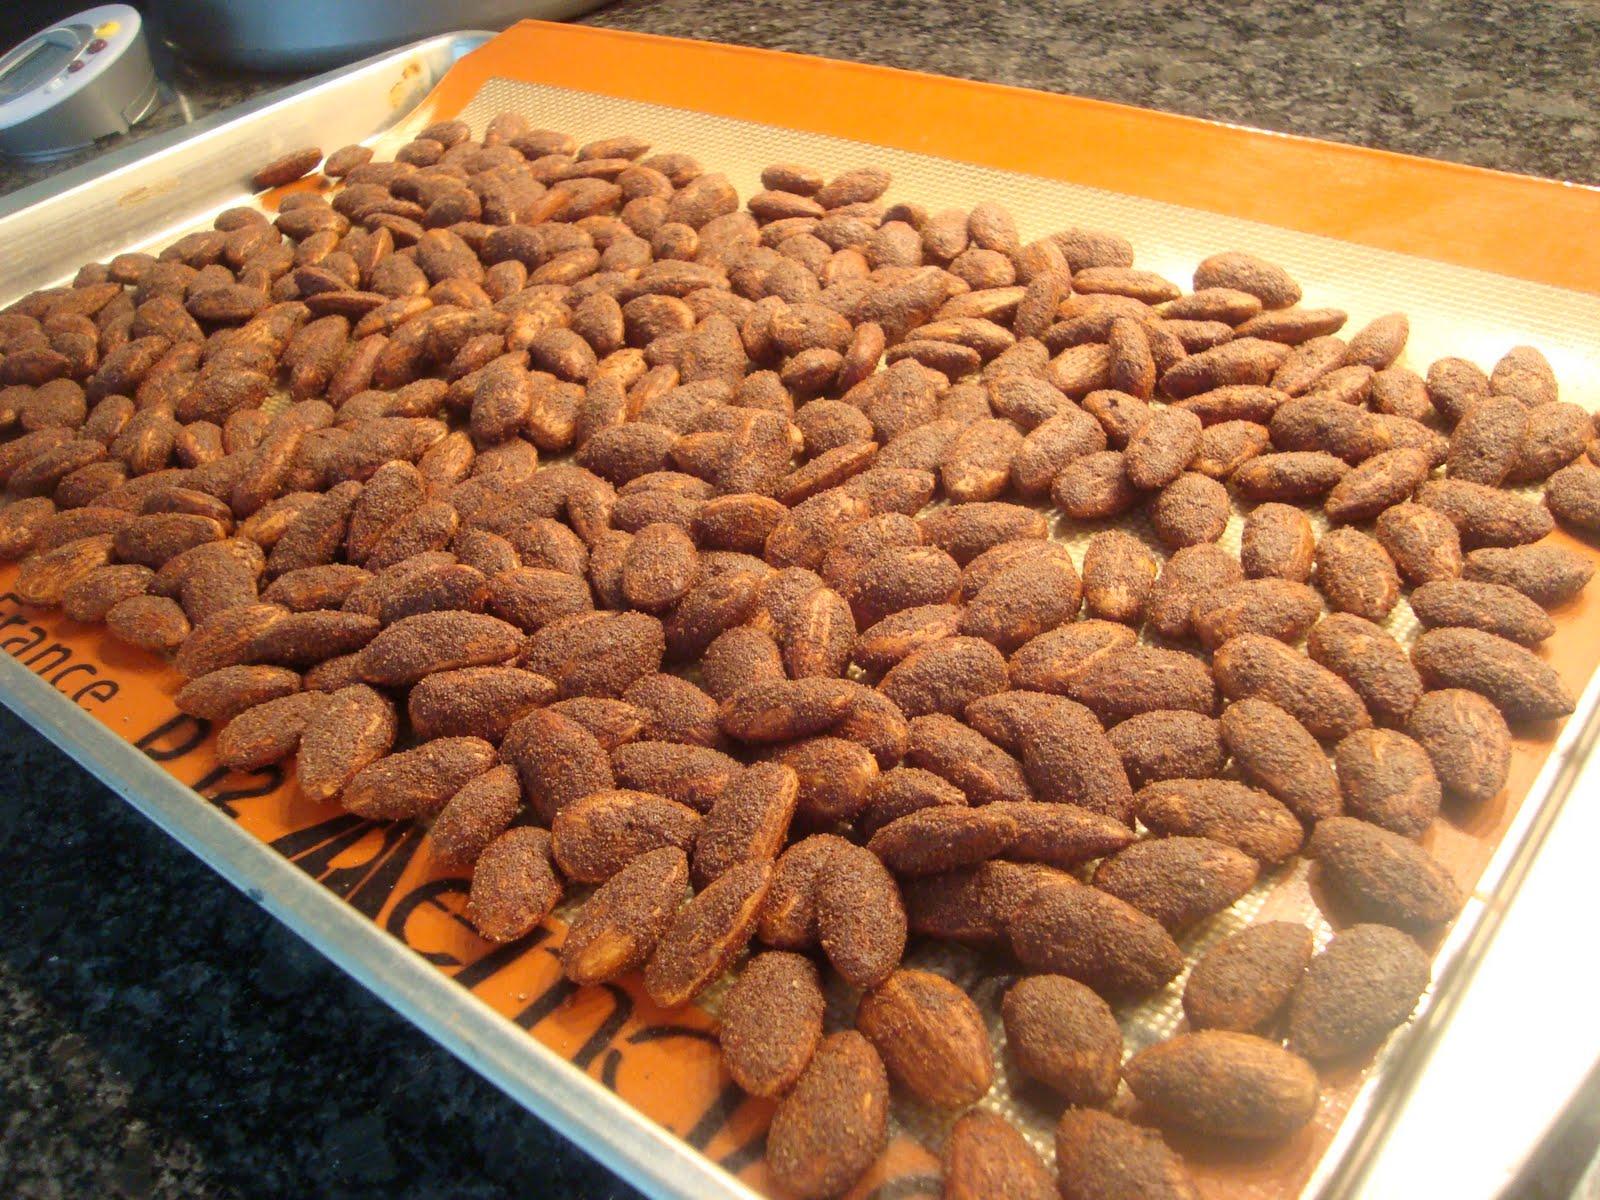 Dove Chocolate Almonds